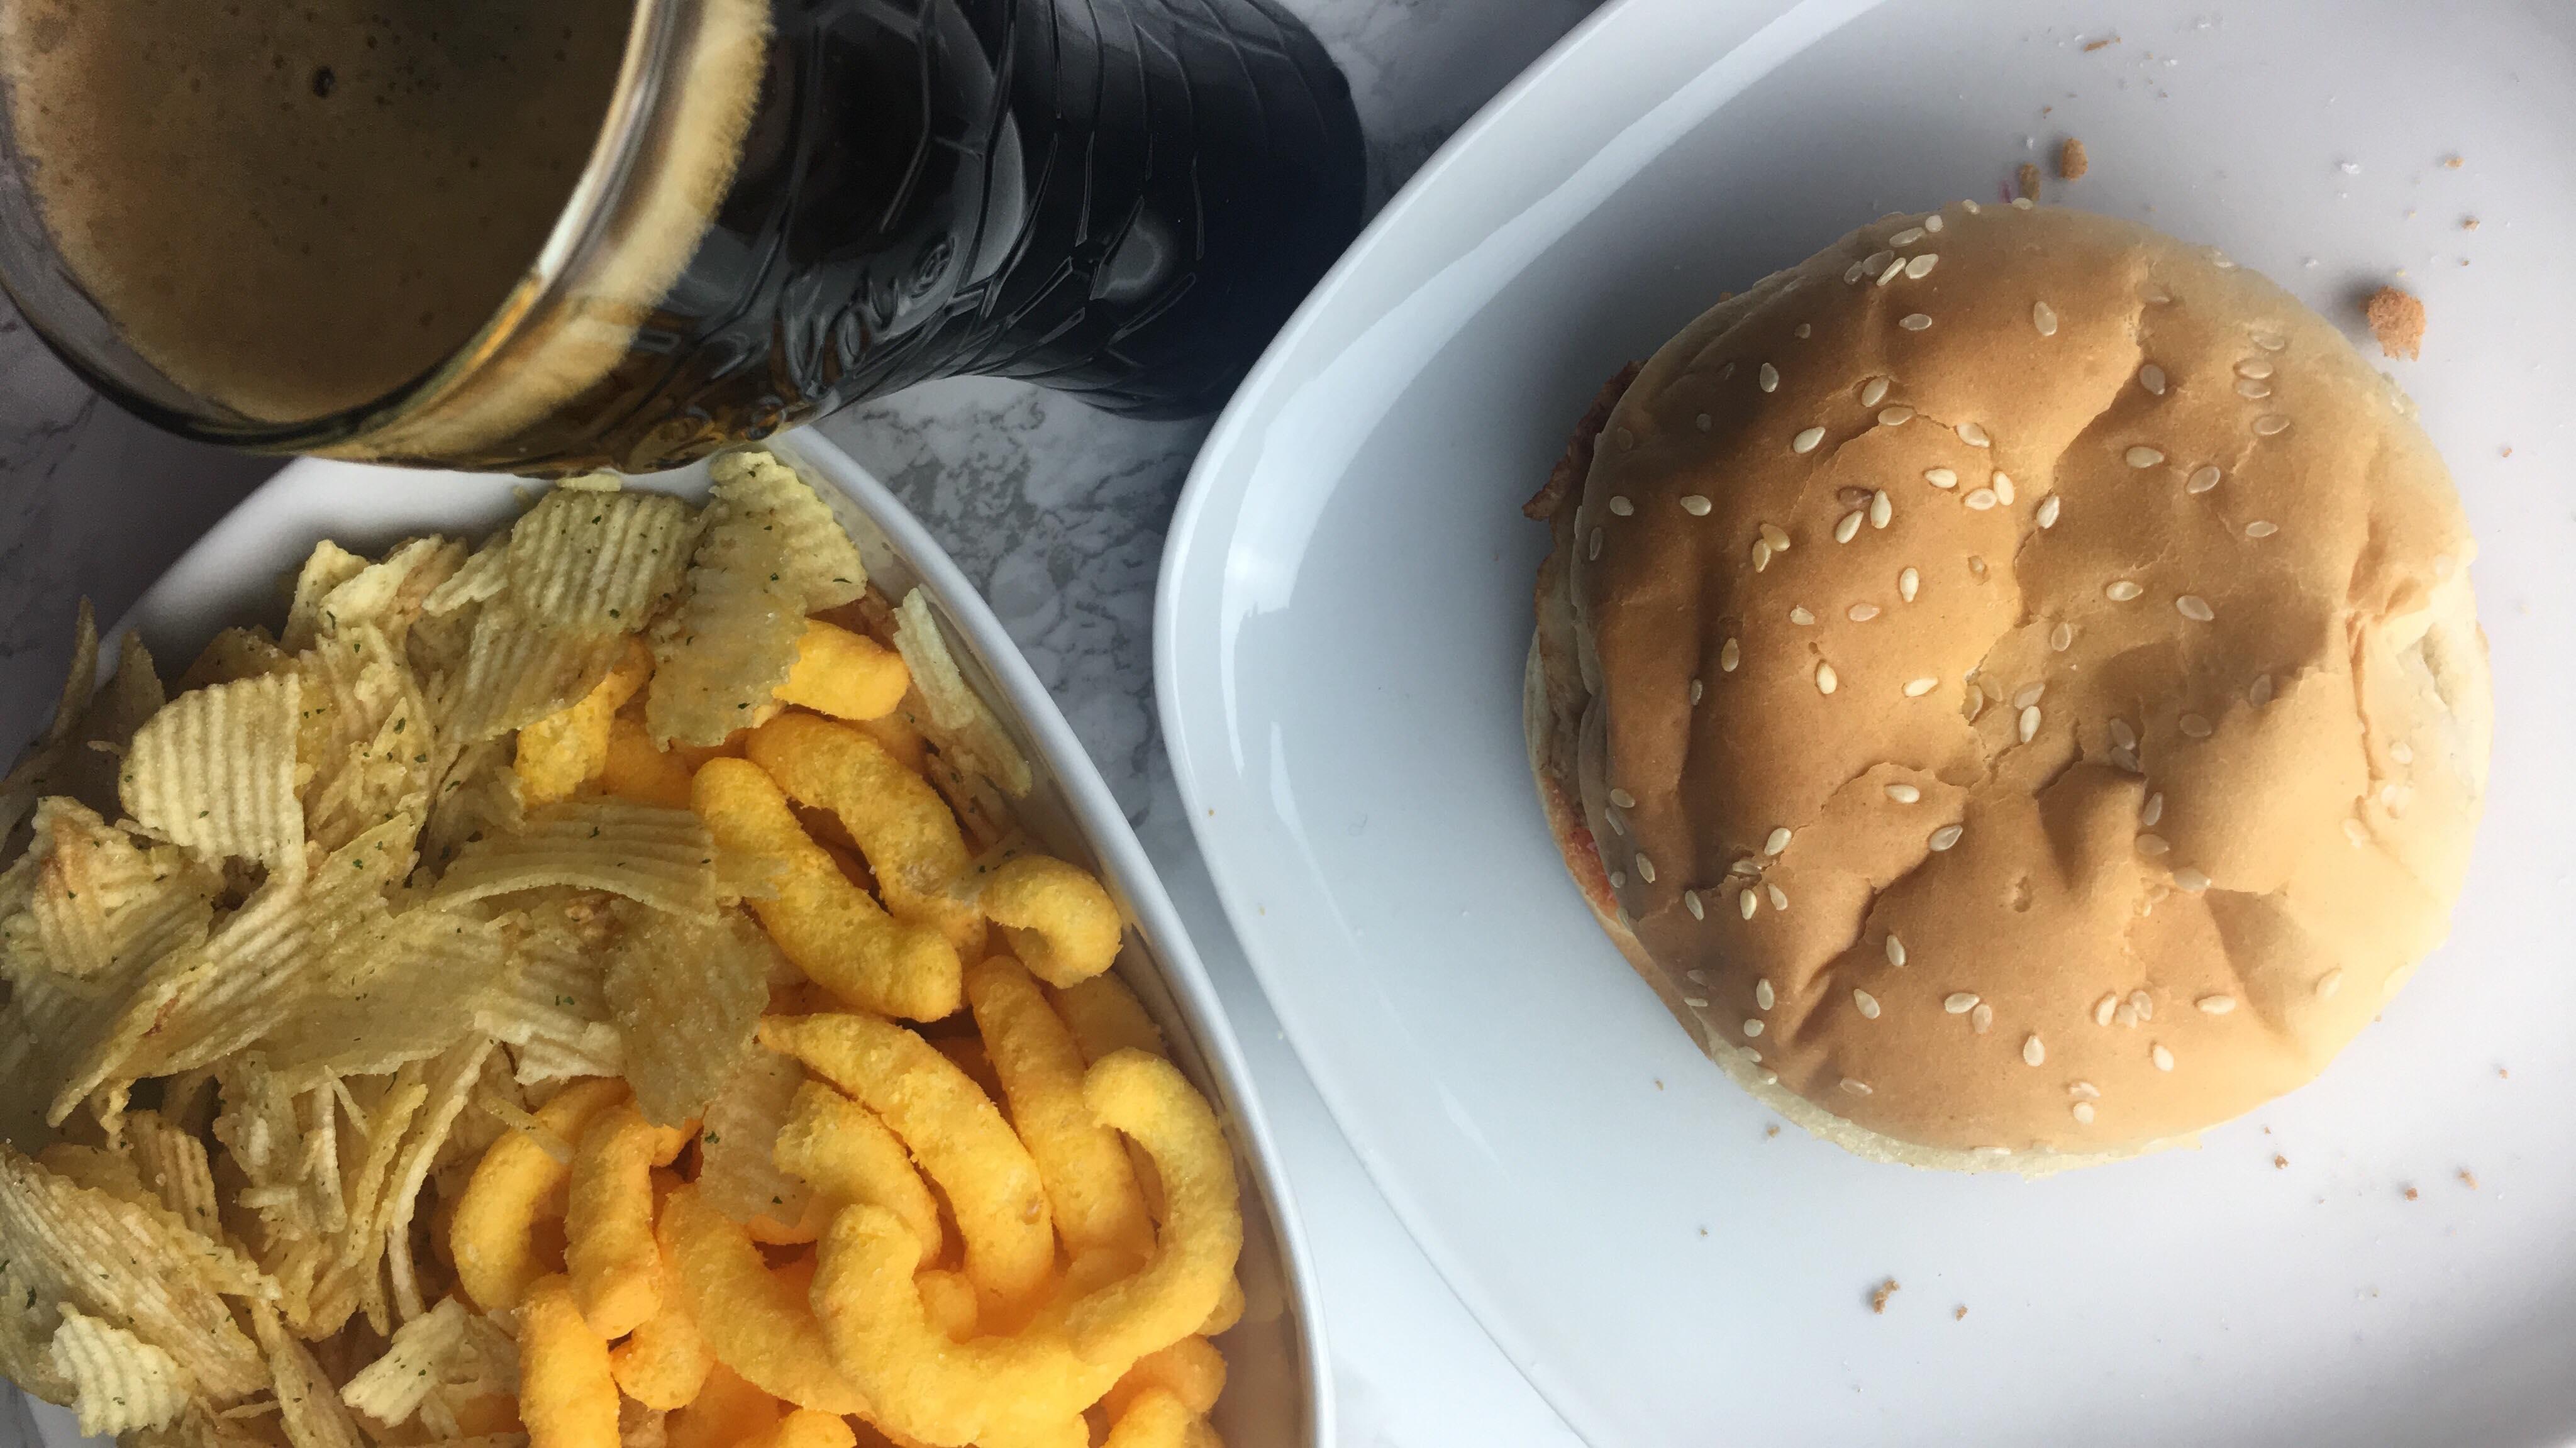 A healthy snack